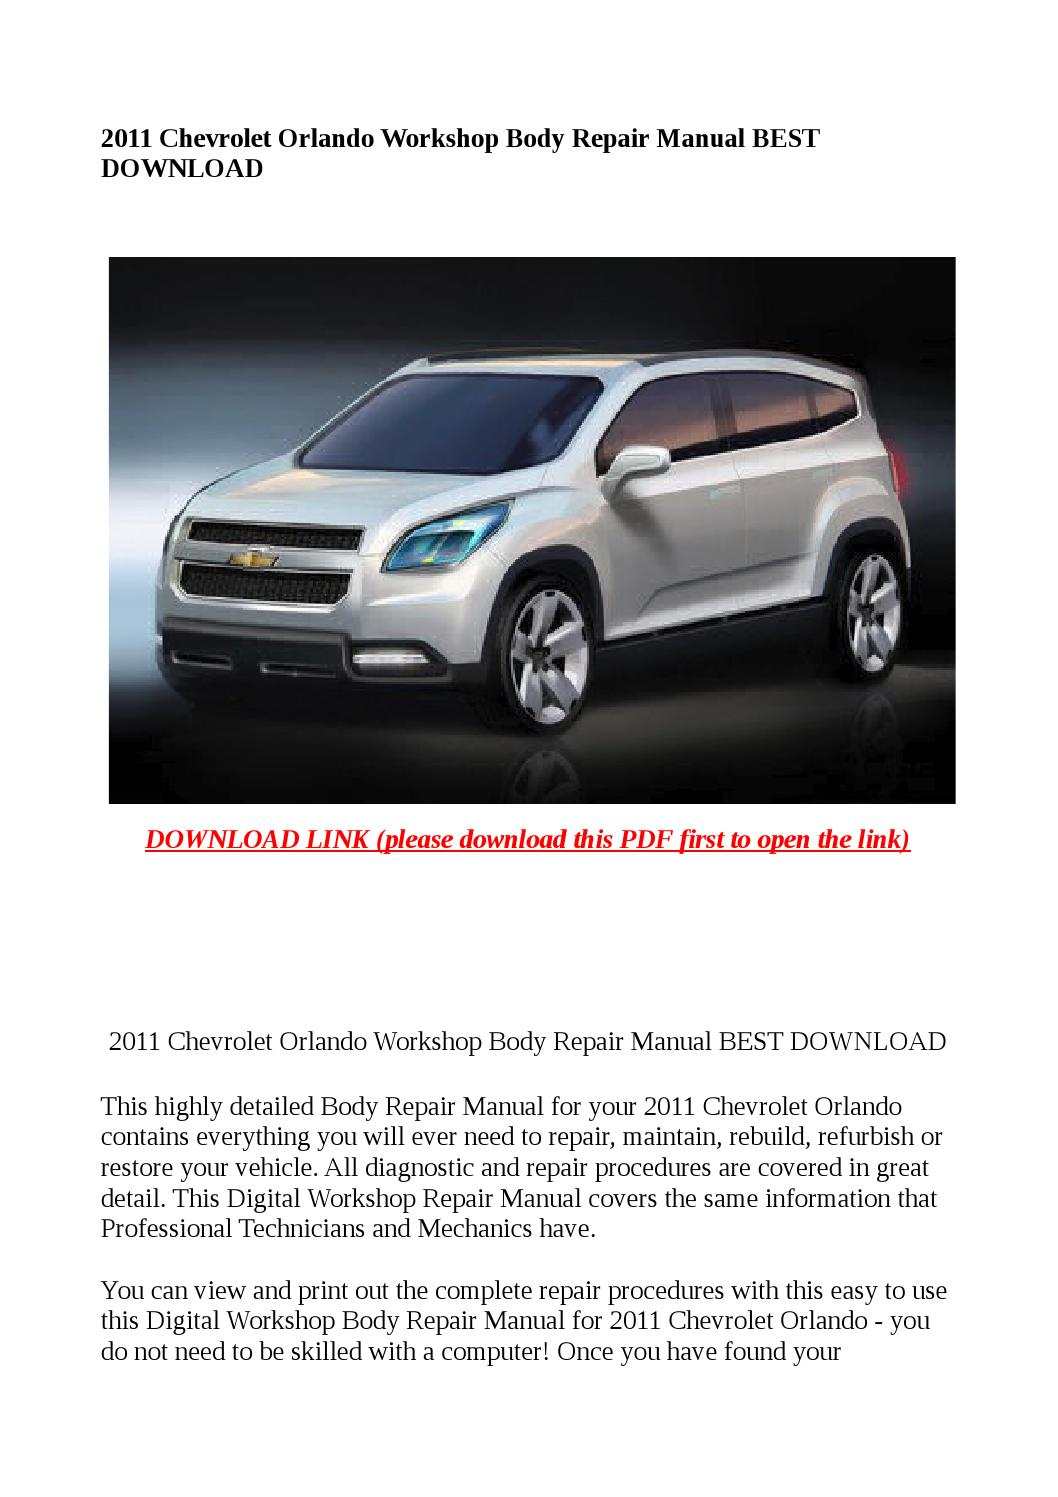 2011 Chevrolet Orlando Workshop Body Repair Manual Best